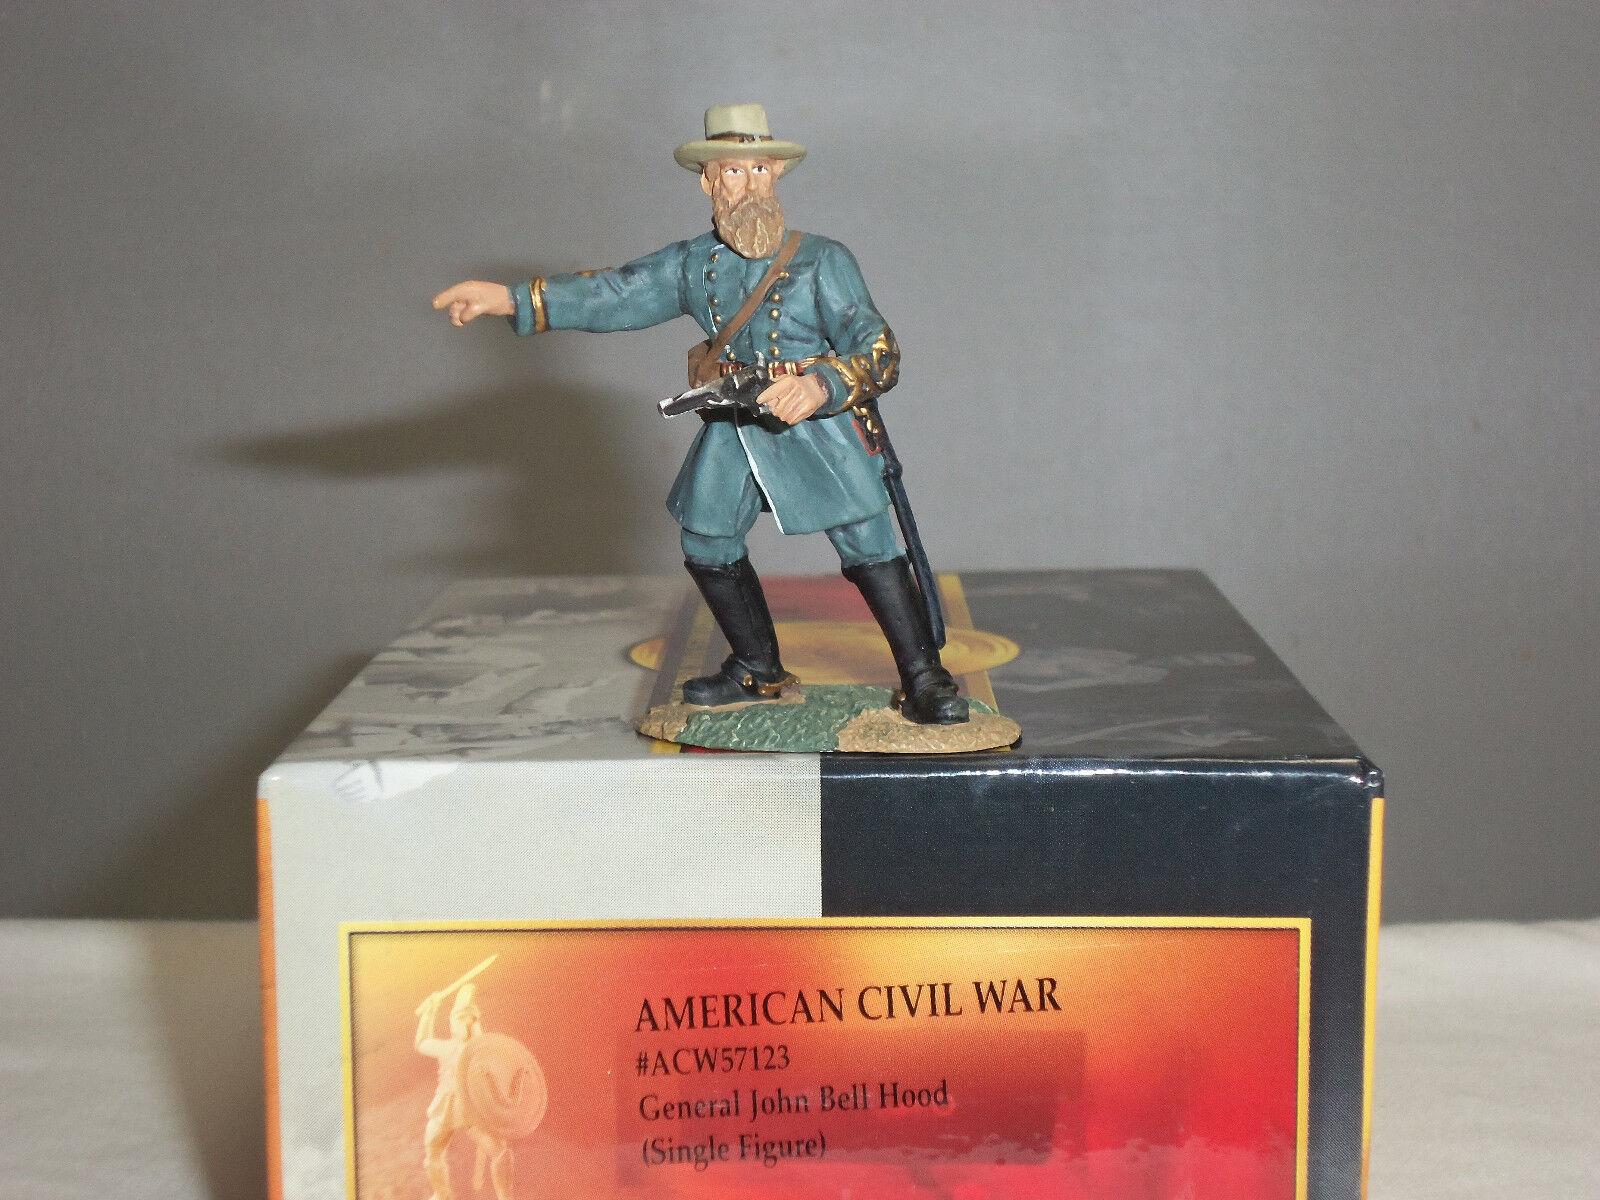 CONTE ACW57123 GENERAL JOHN BELL HOOD AMERICAN CIVIL WAR TOY SOLDIER FIGURE